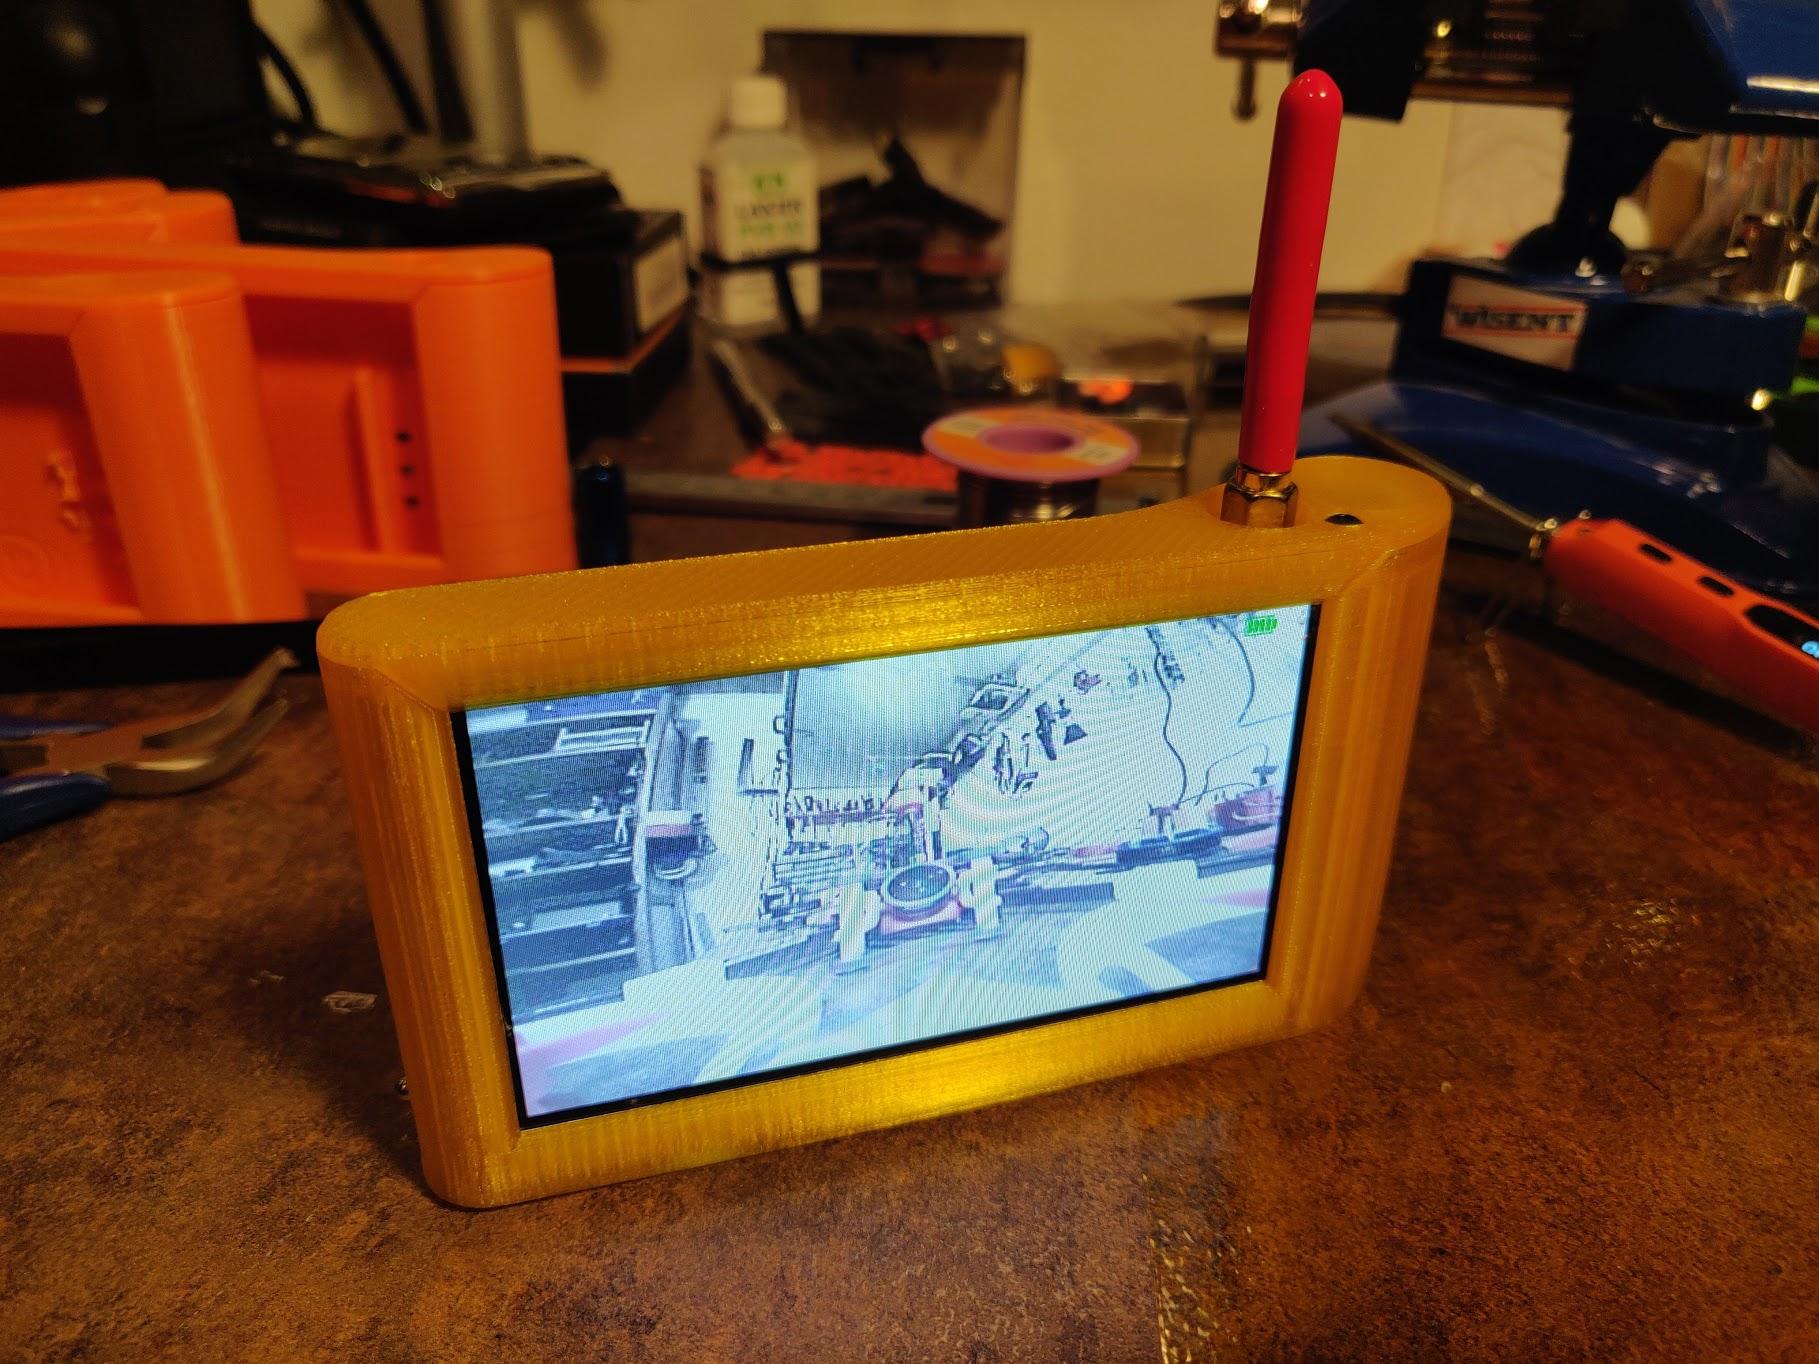 FPV (cheapo) monitor